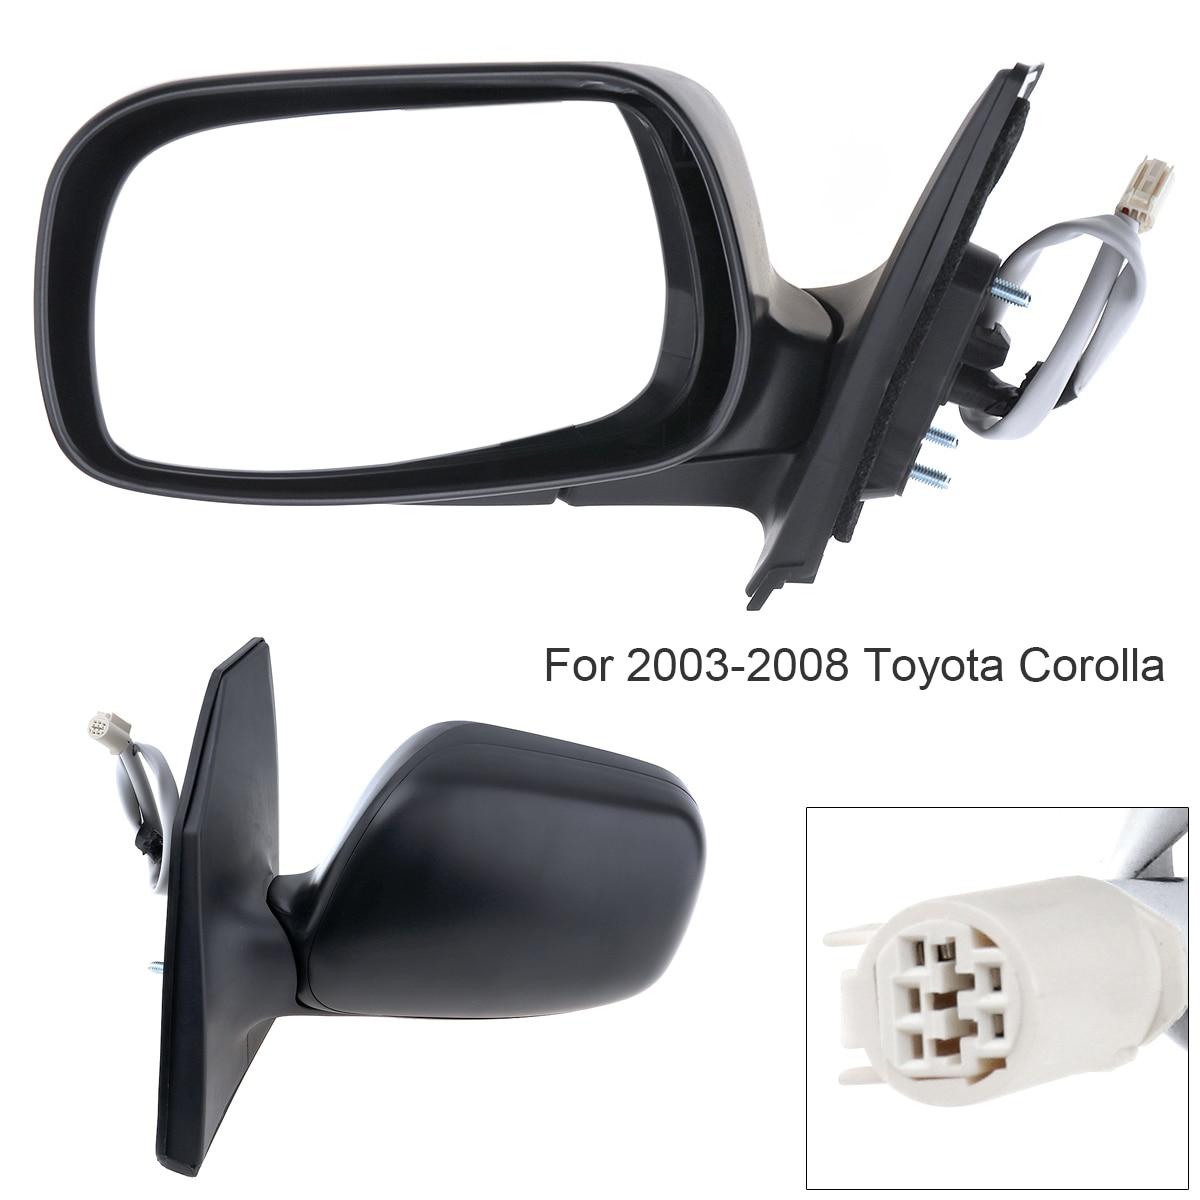 Non-Folding Durable Left Side Mirror Hand LH for 2003-2008 Toyota Corolla CE LE S Sport XRS Sedan 4 Door